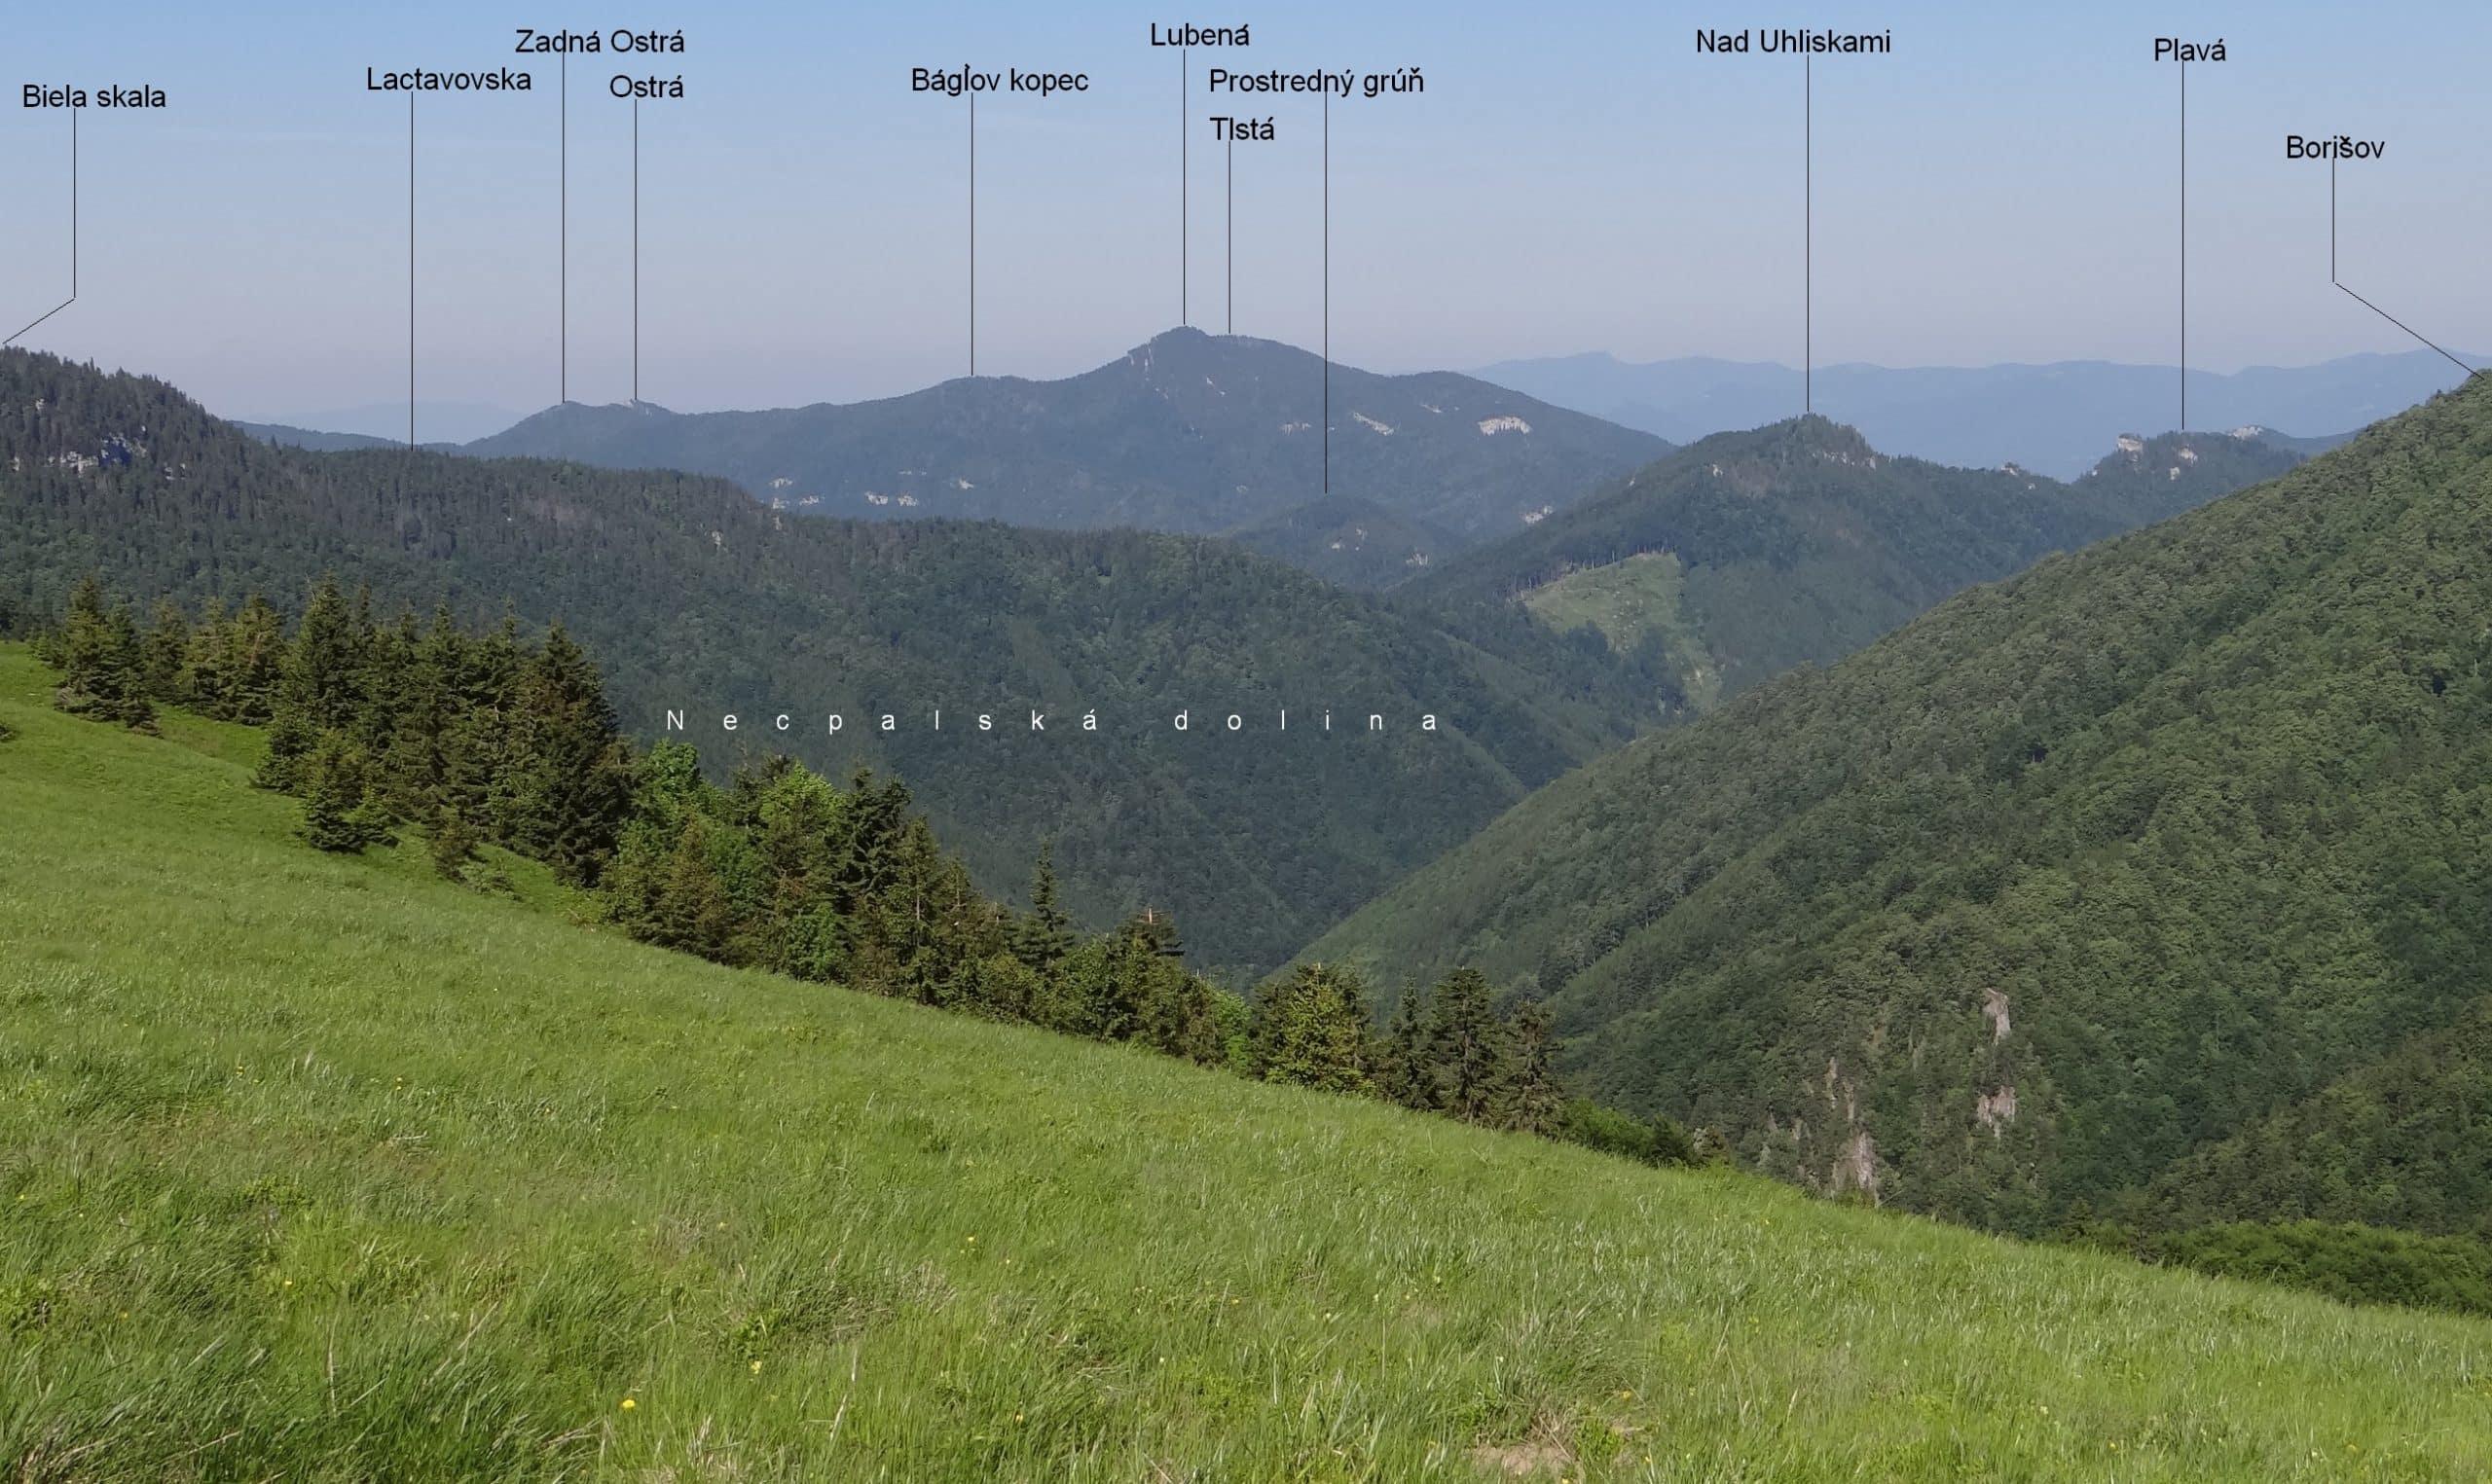 Necpalská dolina